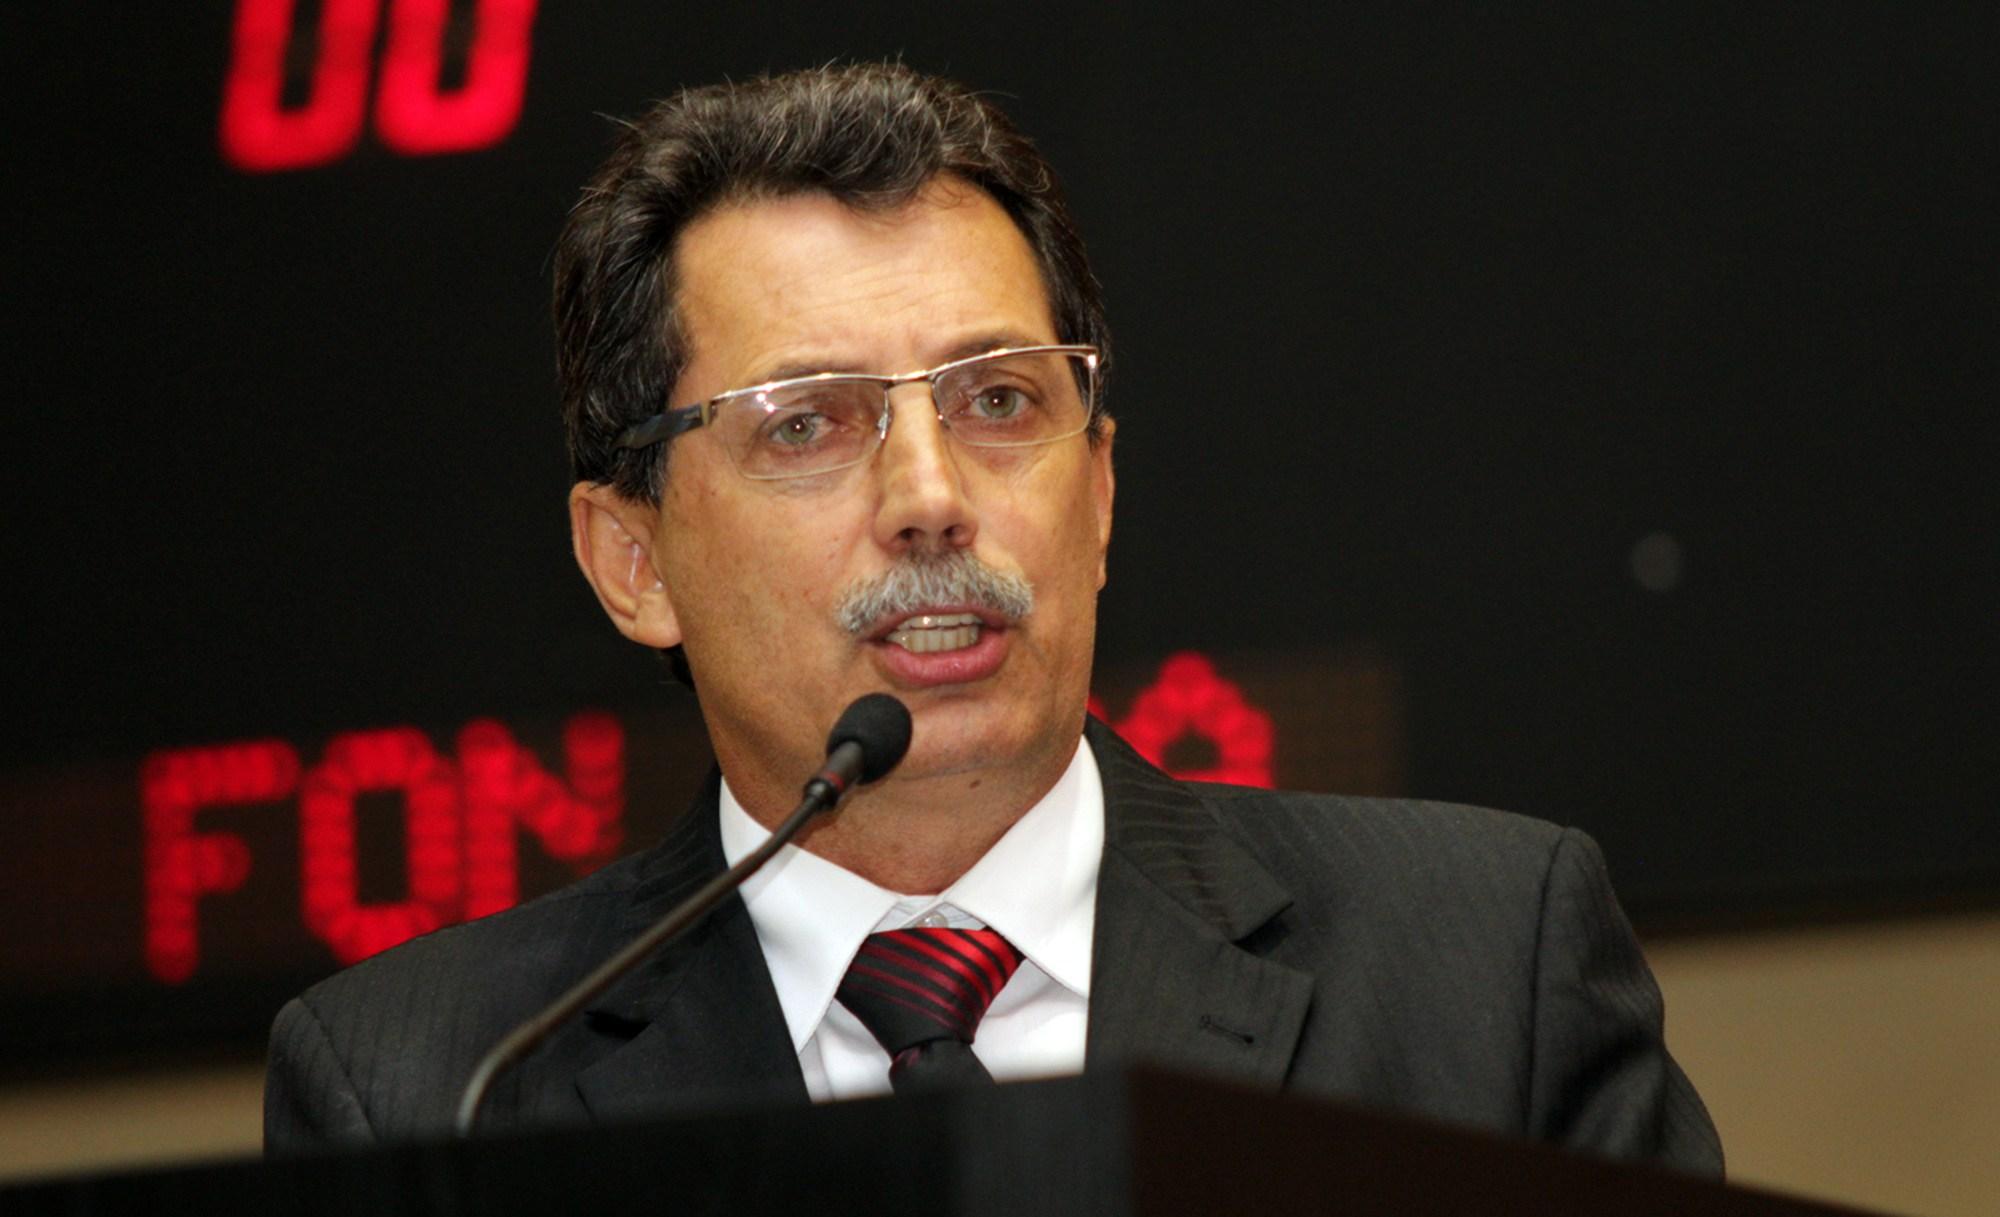 MP Eleitoral denuncia deputado federal por propaganda eleitoral antecipada